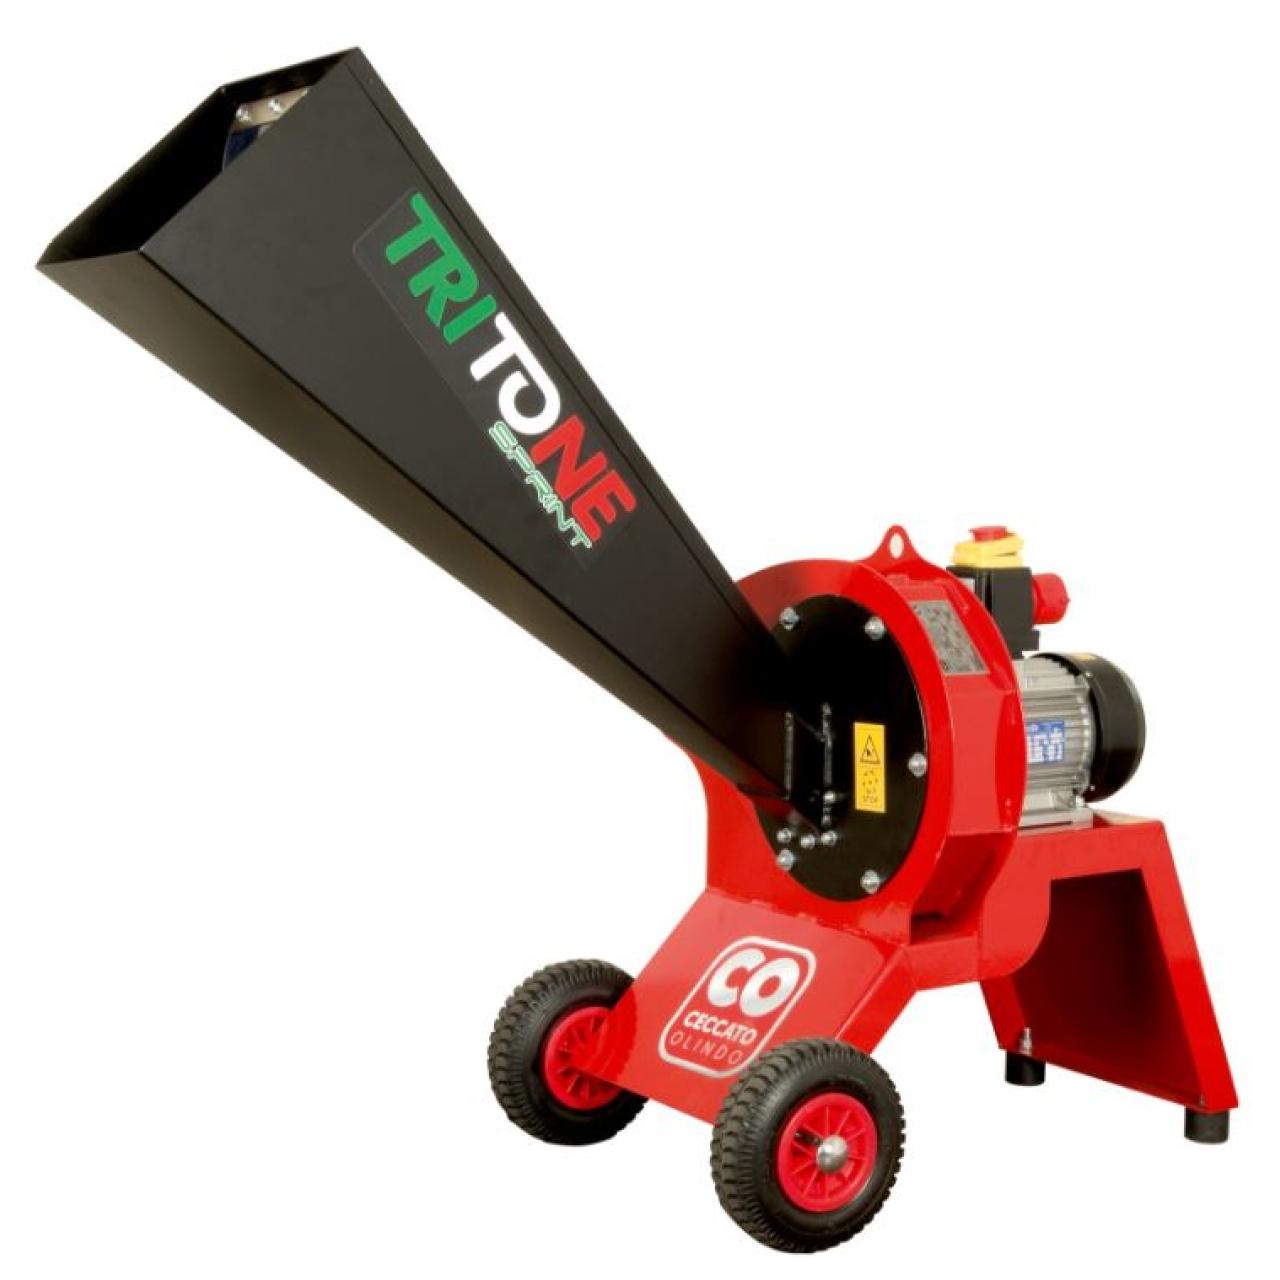 Gartenhäcksler Sprint 400 Volt